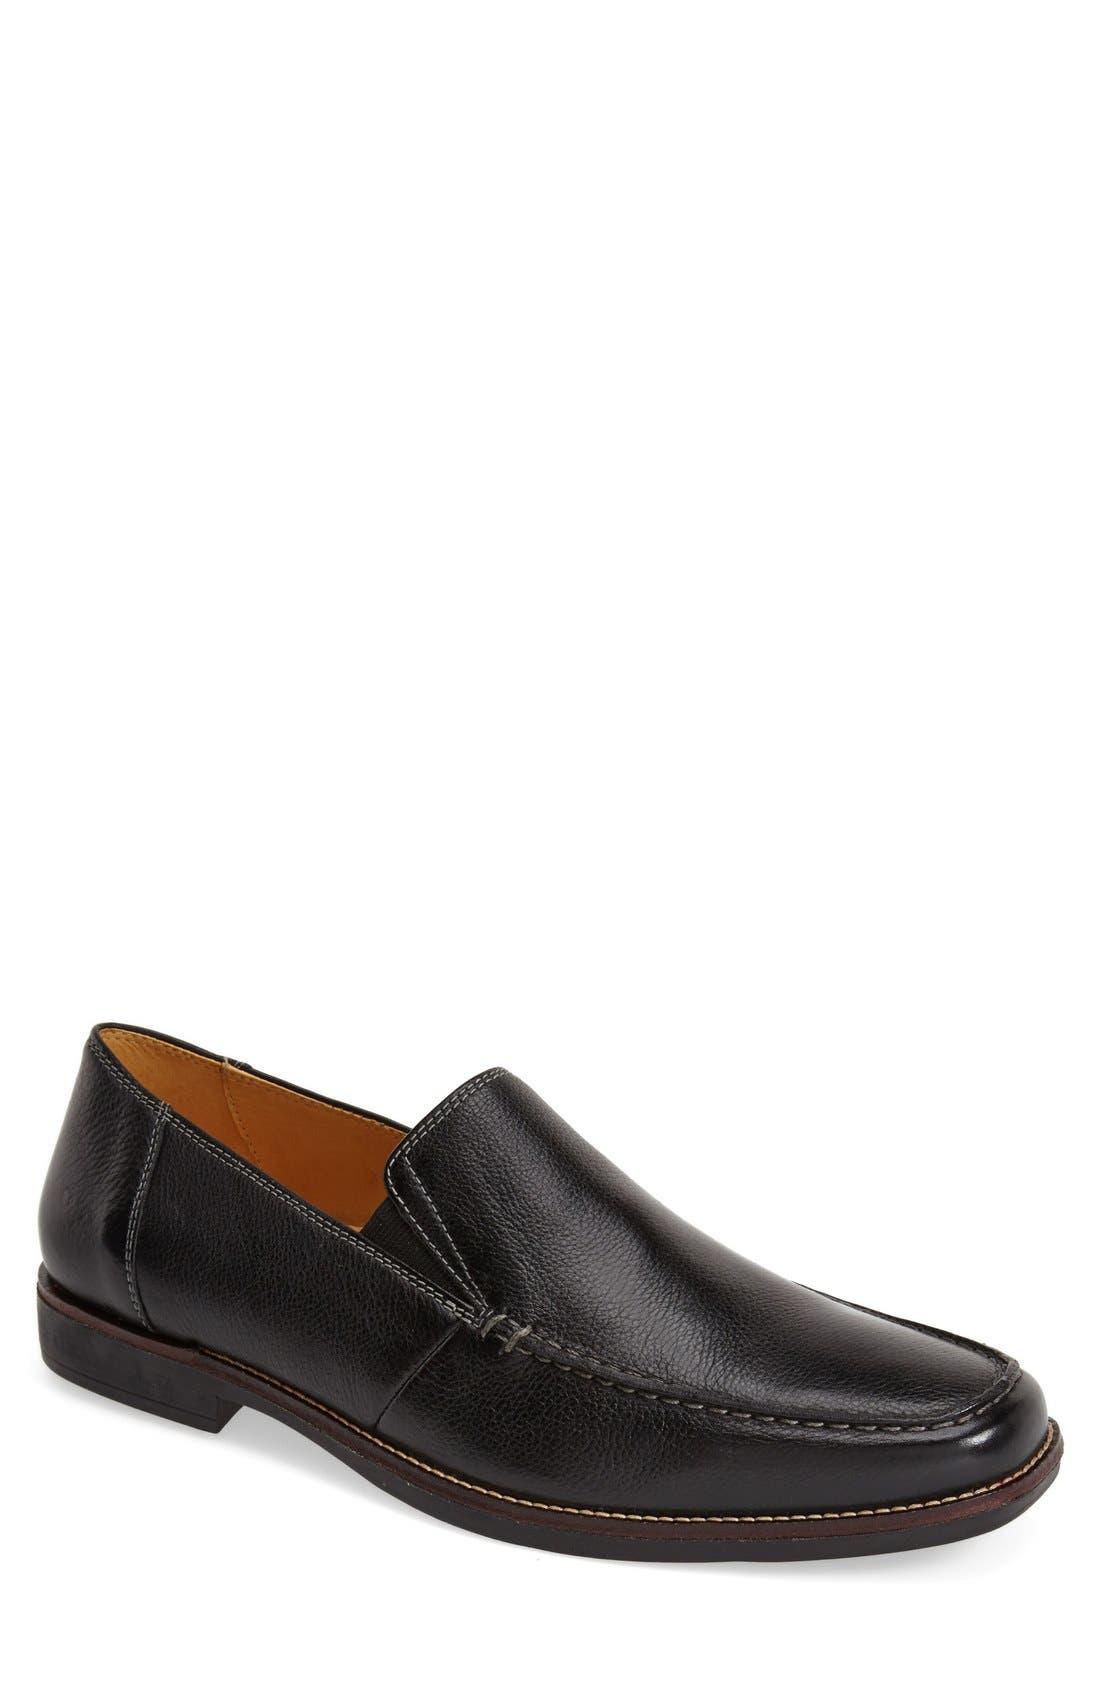 'Easy' Leather Venetian Loafer,                         Main,                         color, Black